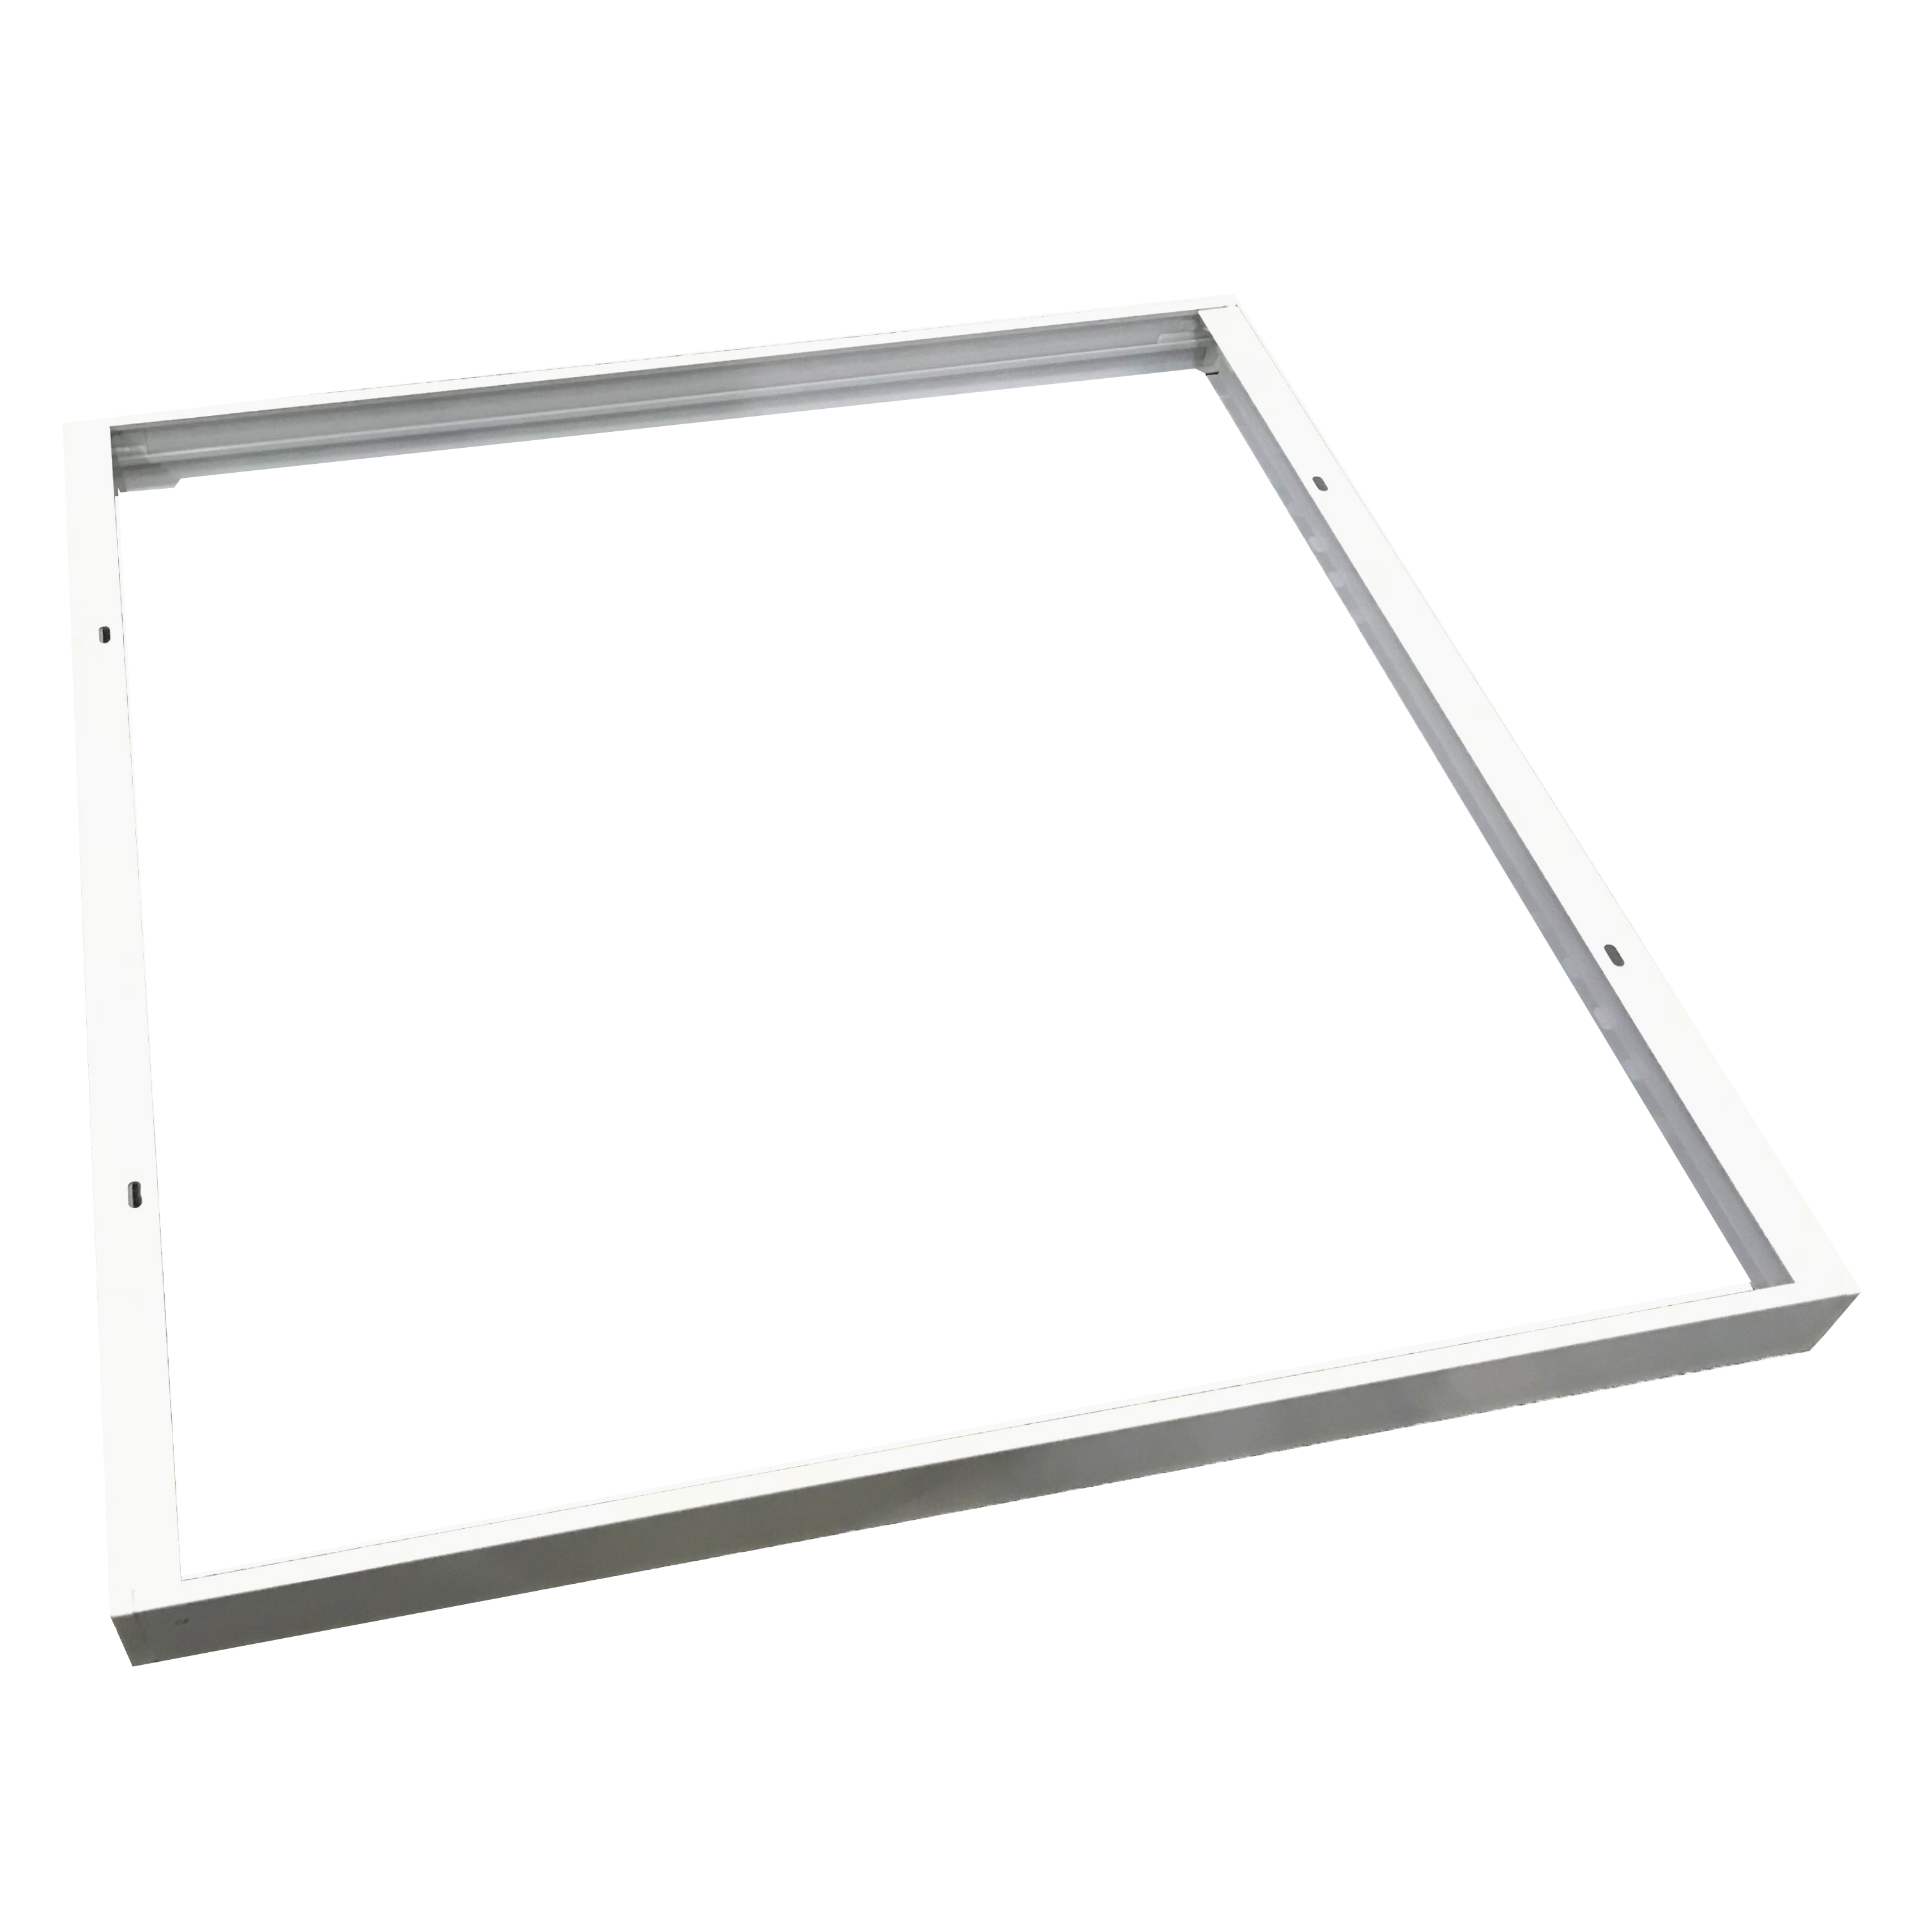 1 Stk Aufbaurahmen für LED Panels Serie Lano 4 LED M600 und M620 LITP0026--